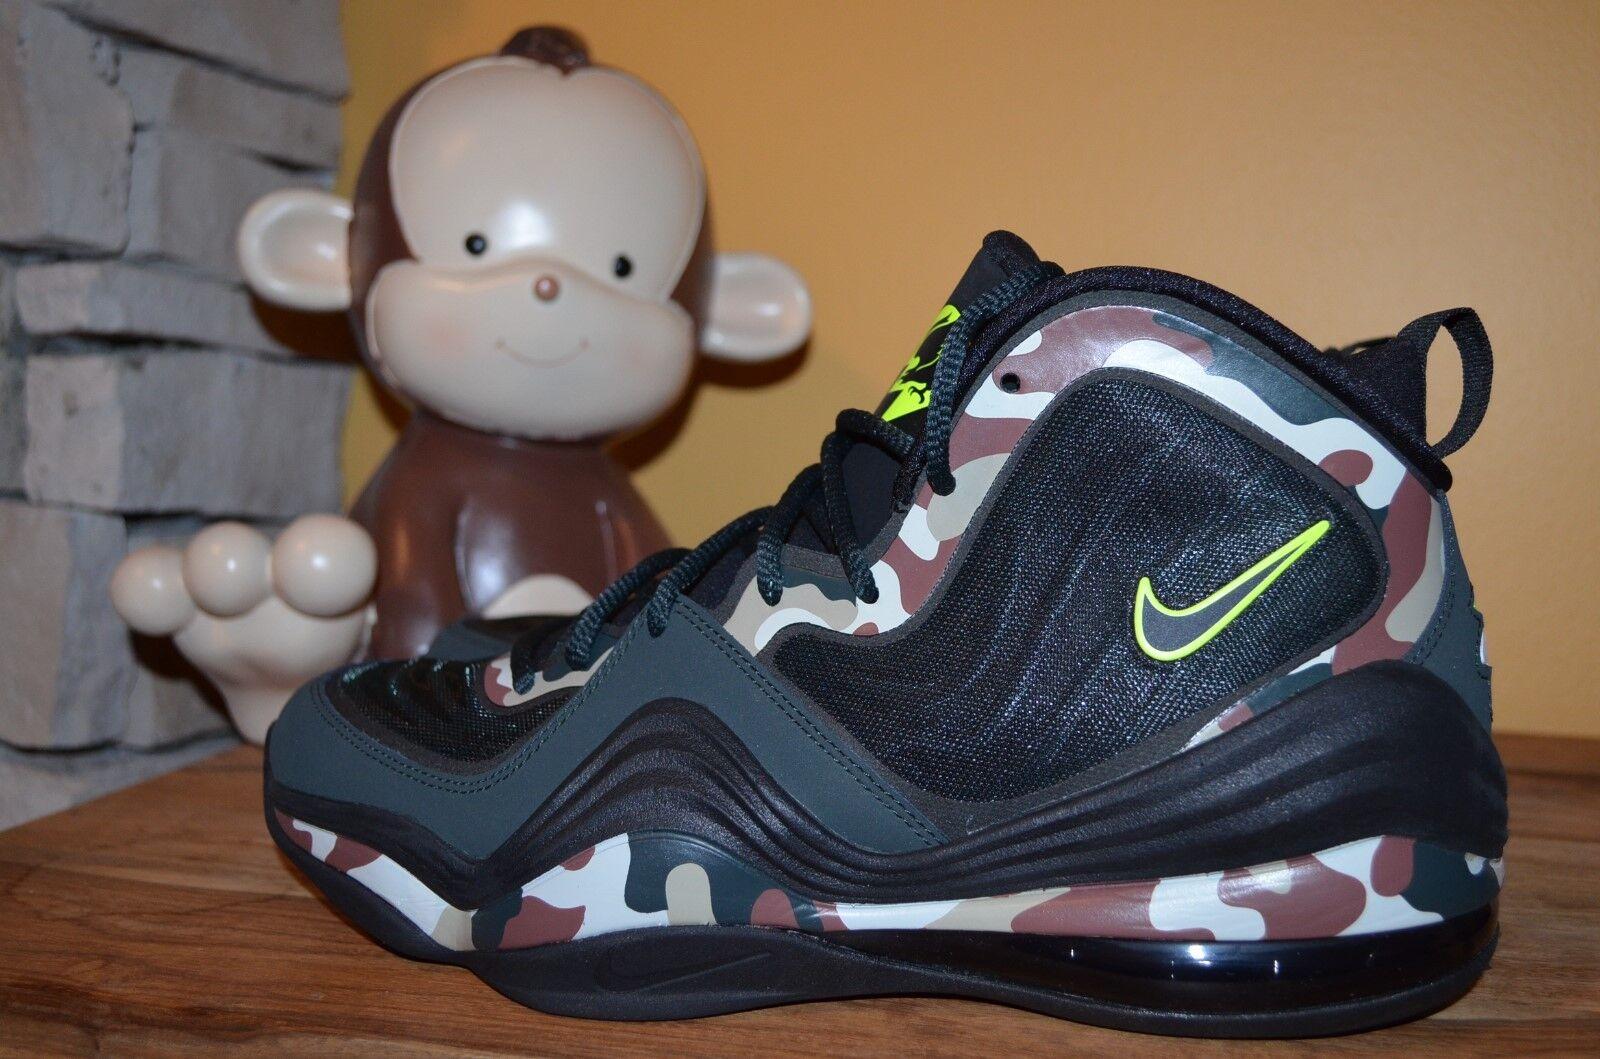 NEW NIKE AIR PENNY V 5 CAMO 10 Shoes Mismate 10.5 Left 10 CAMO Right 628569-307 Hardaway f6928a